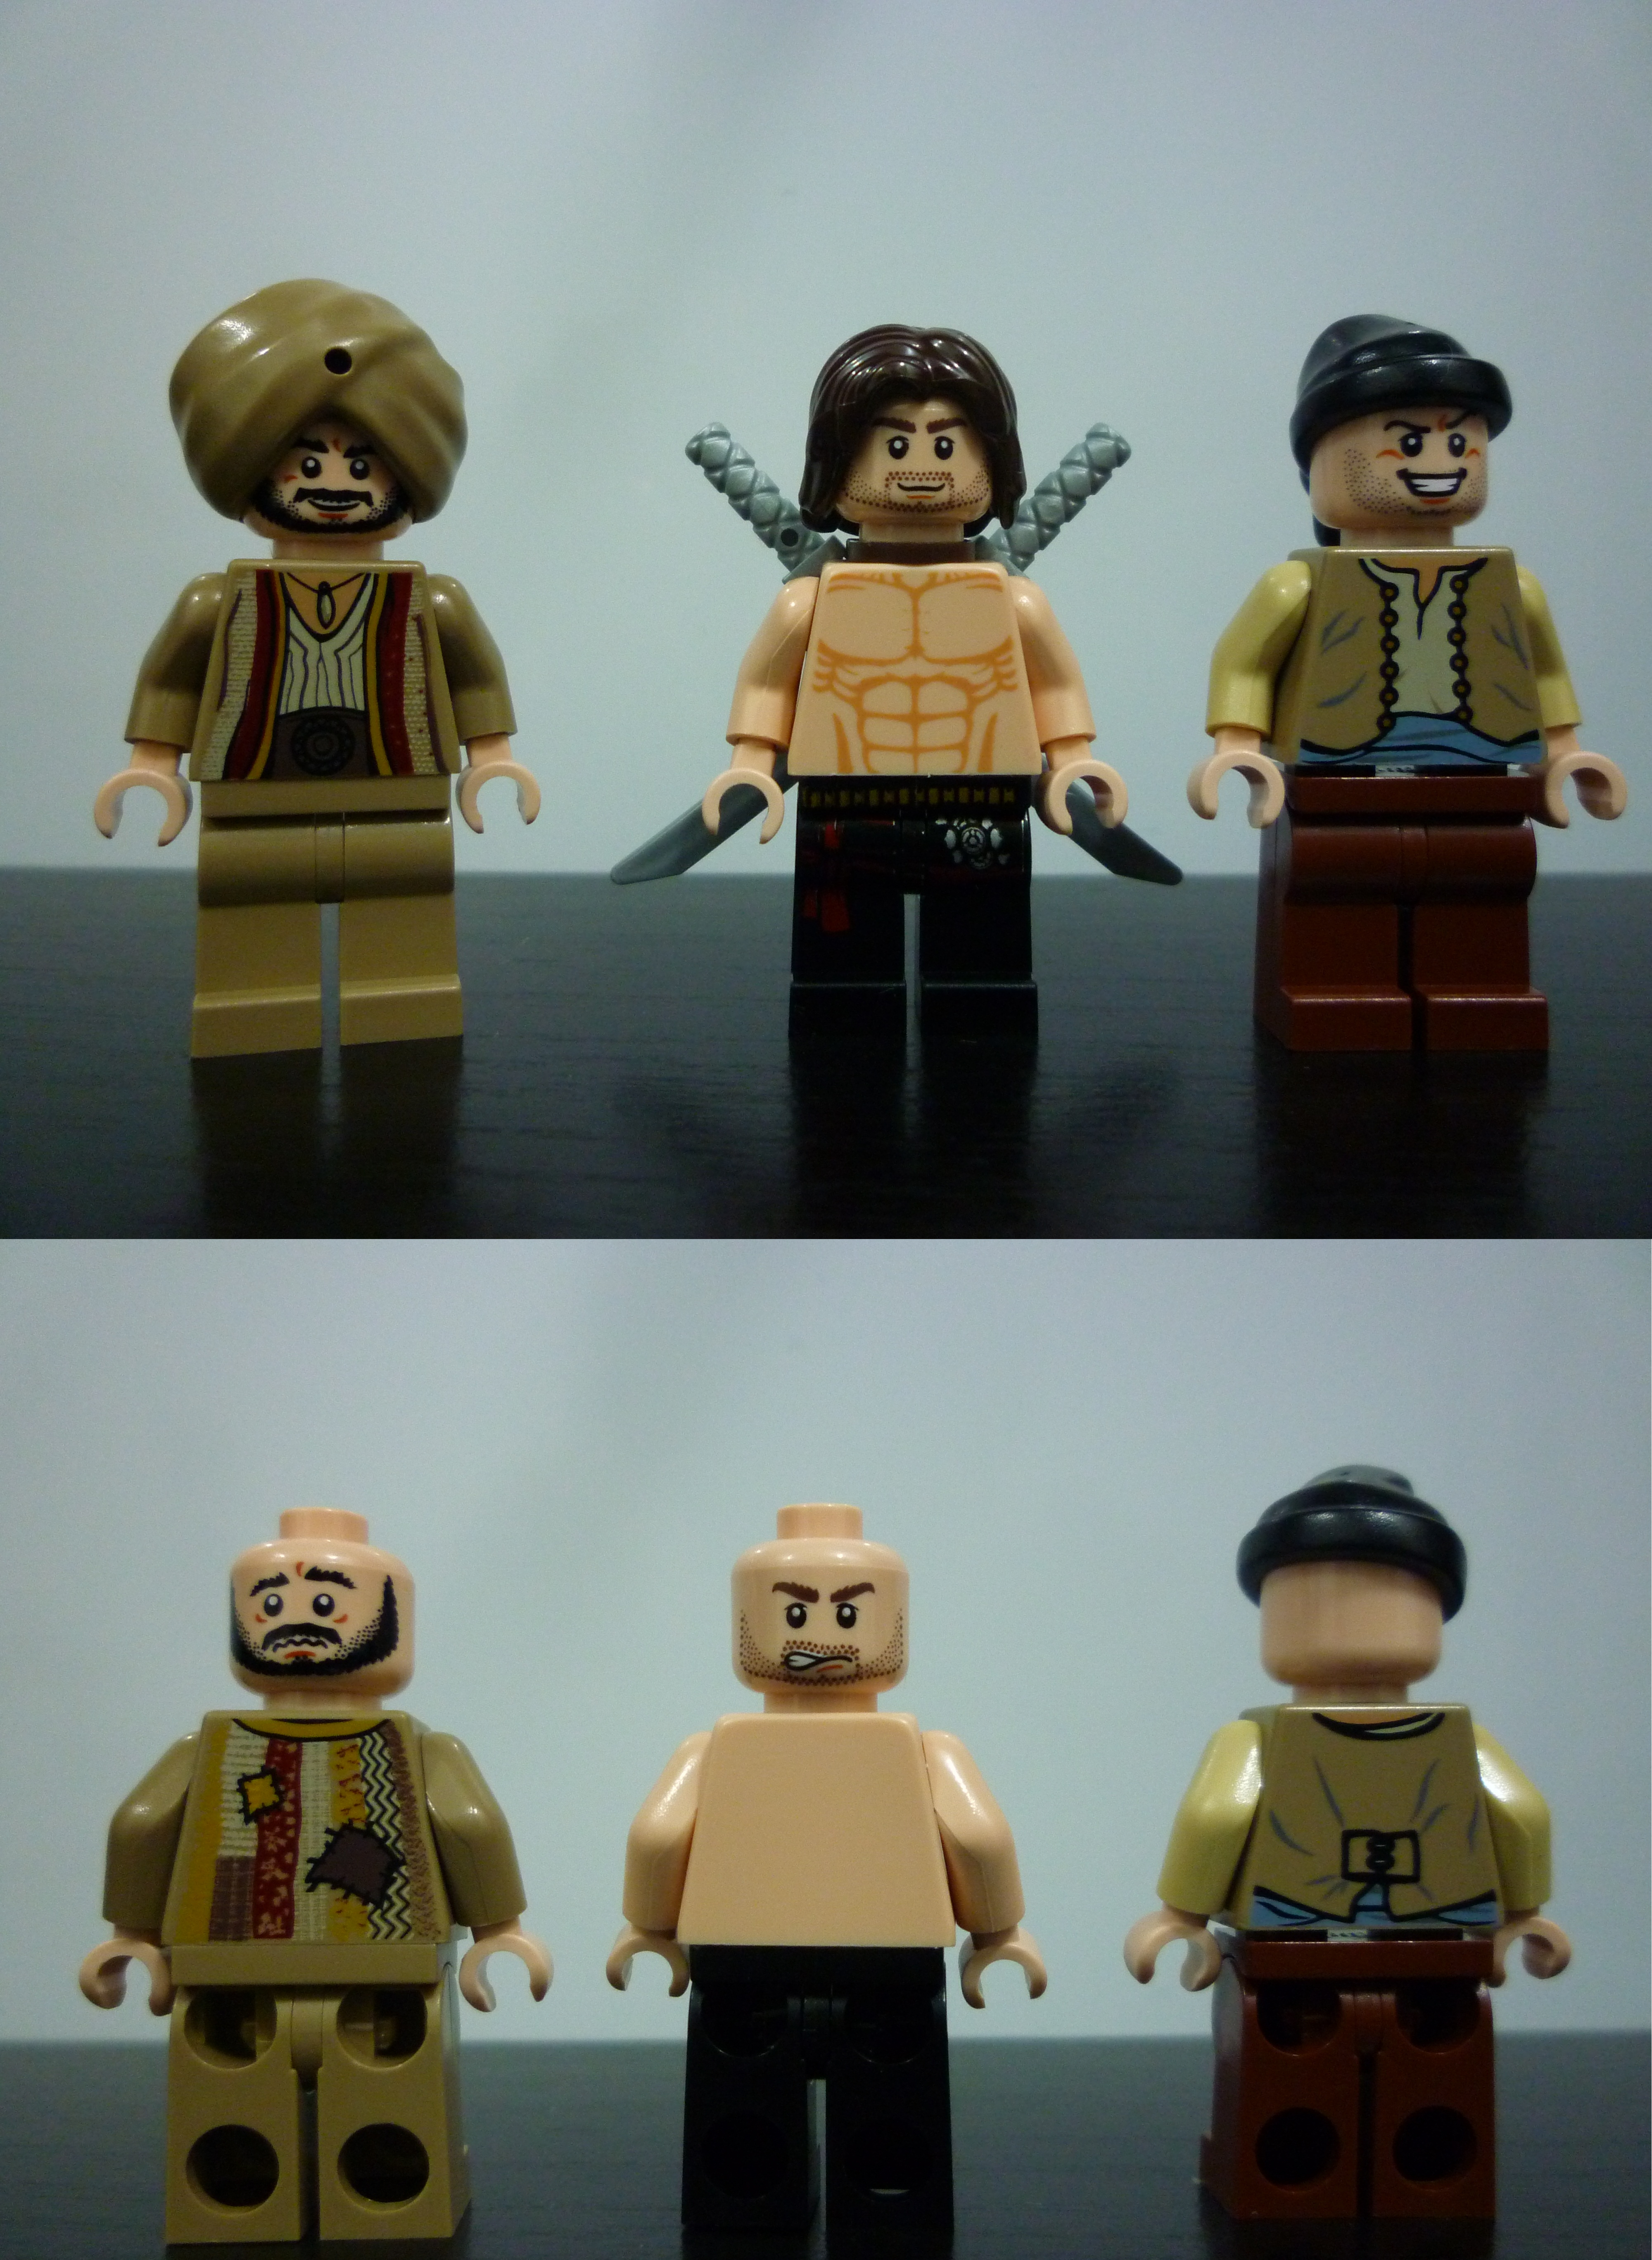 Lego Mini Figure Prince Of Persia Ostrich 7570 Loose